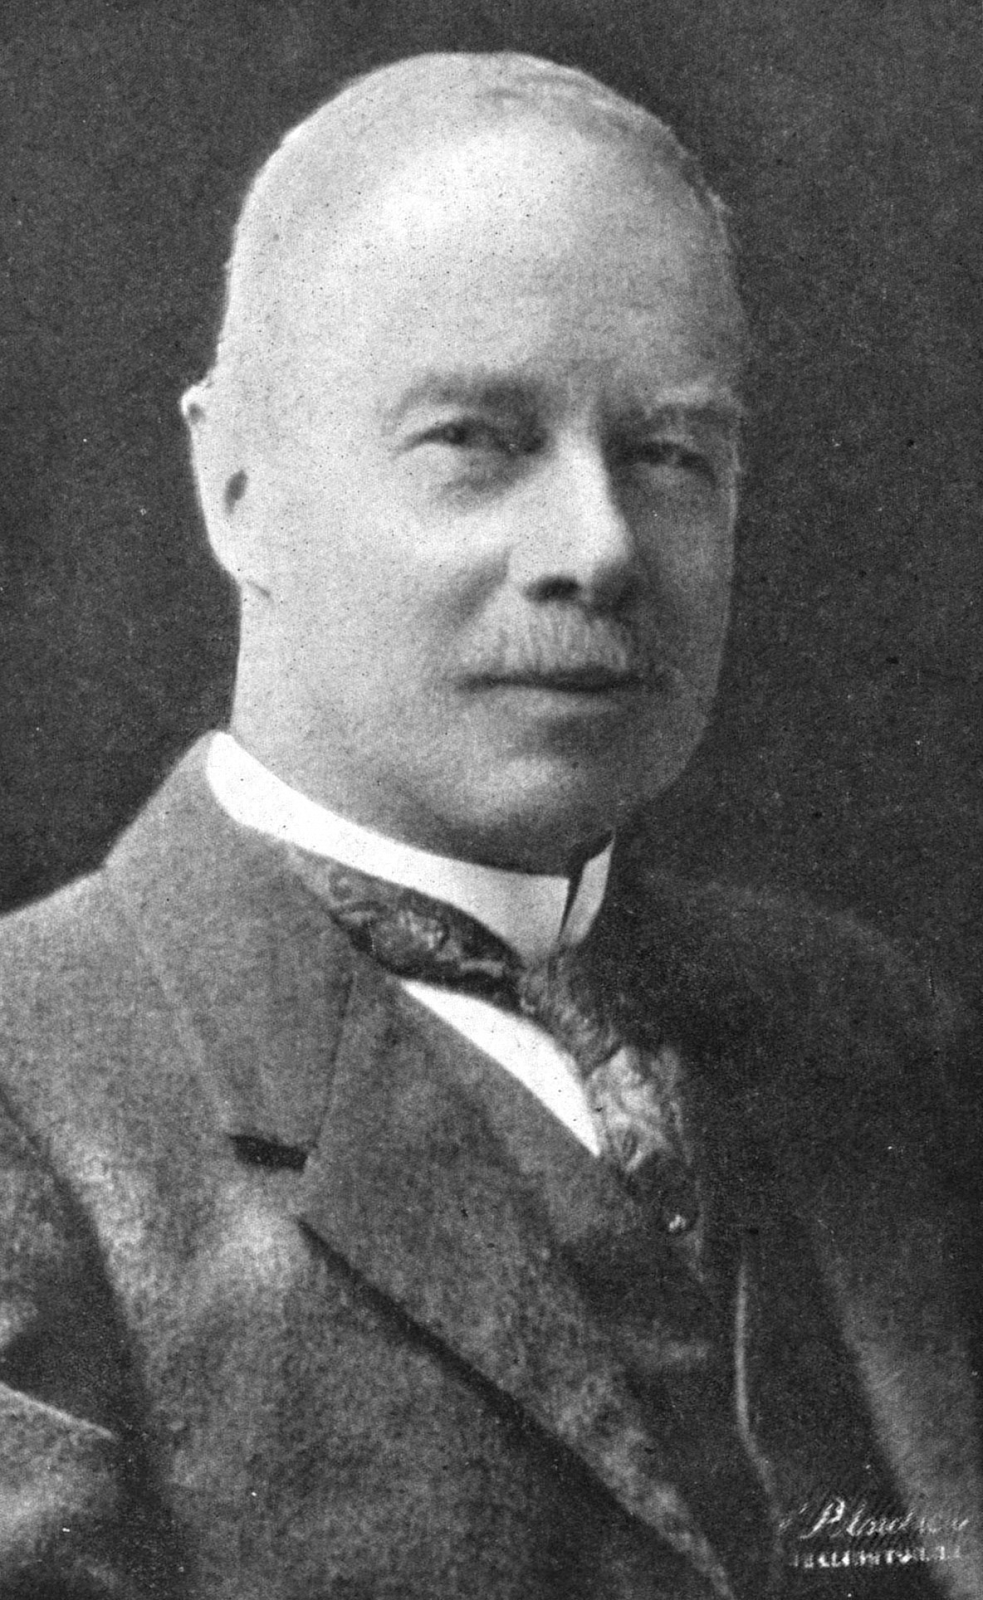 A portrait of George Hudson